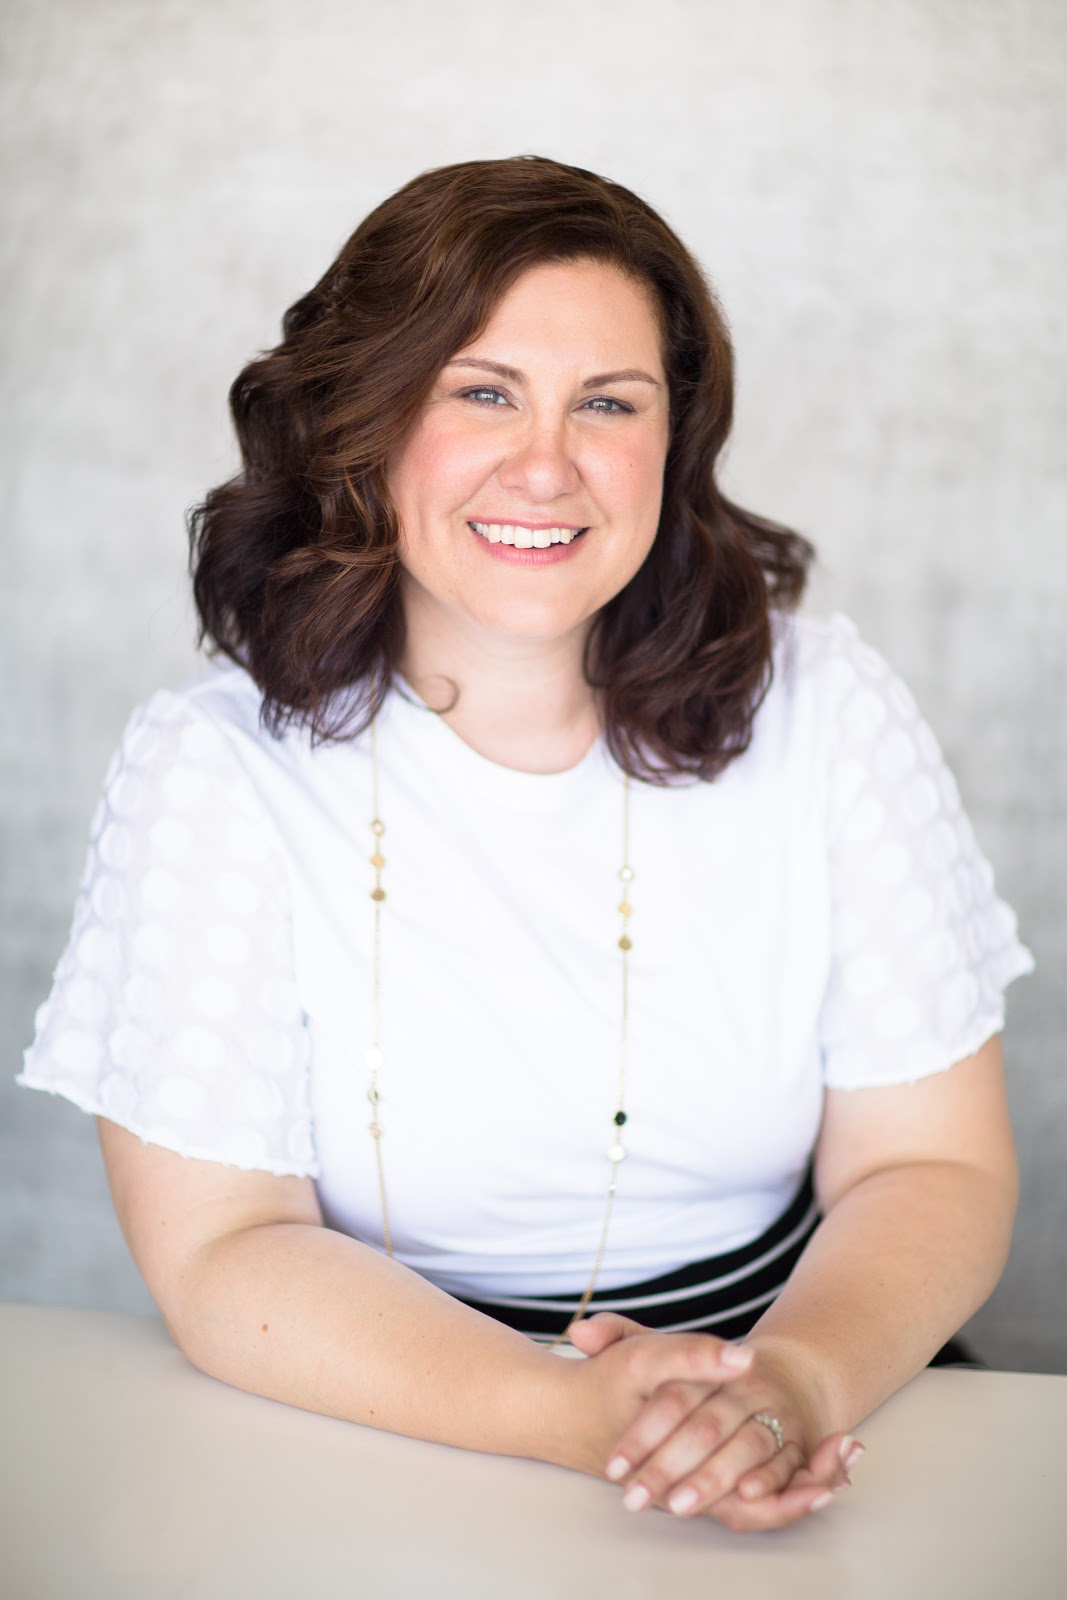 Sharon Stolt